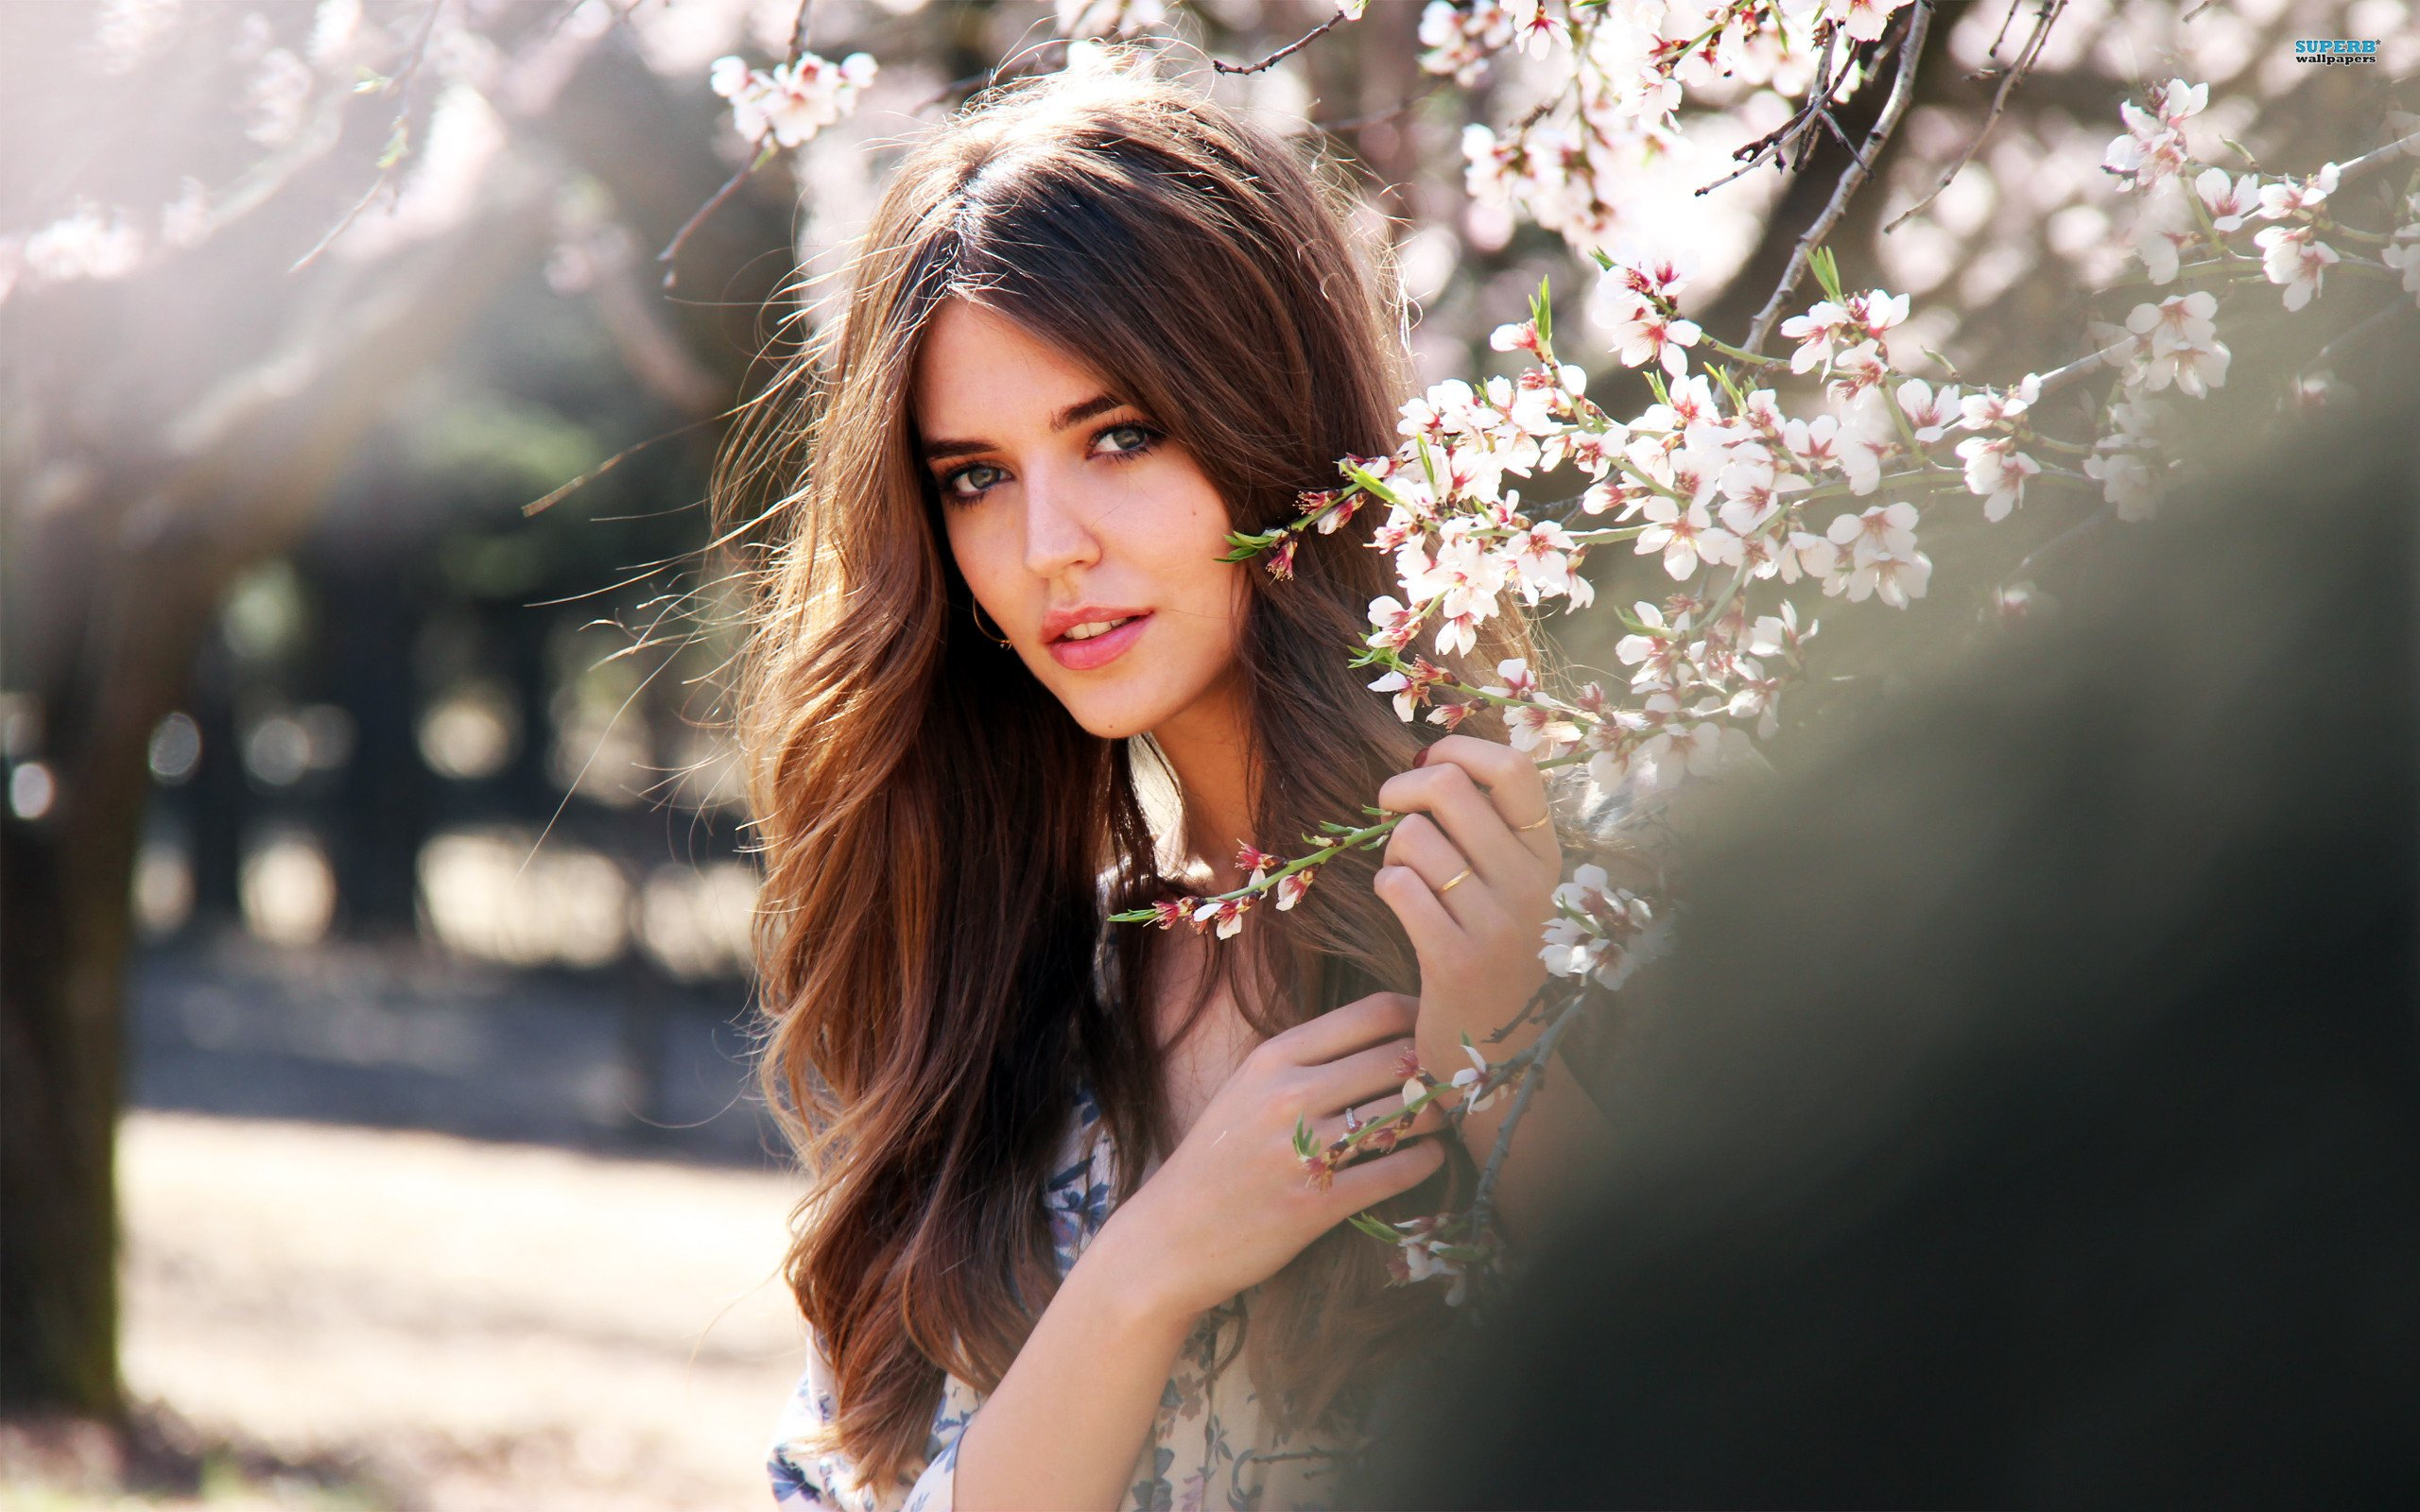 Beautiful spanish model clara alonso hd wallpaper - Beautiful model wallpaper ...